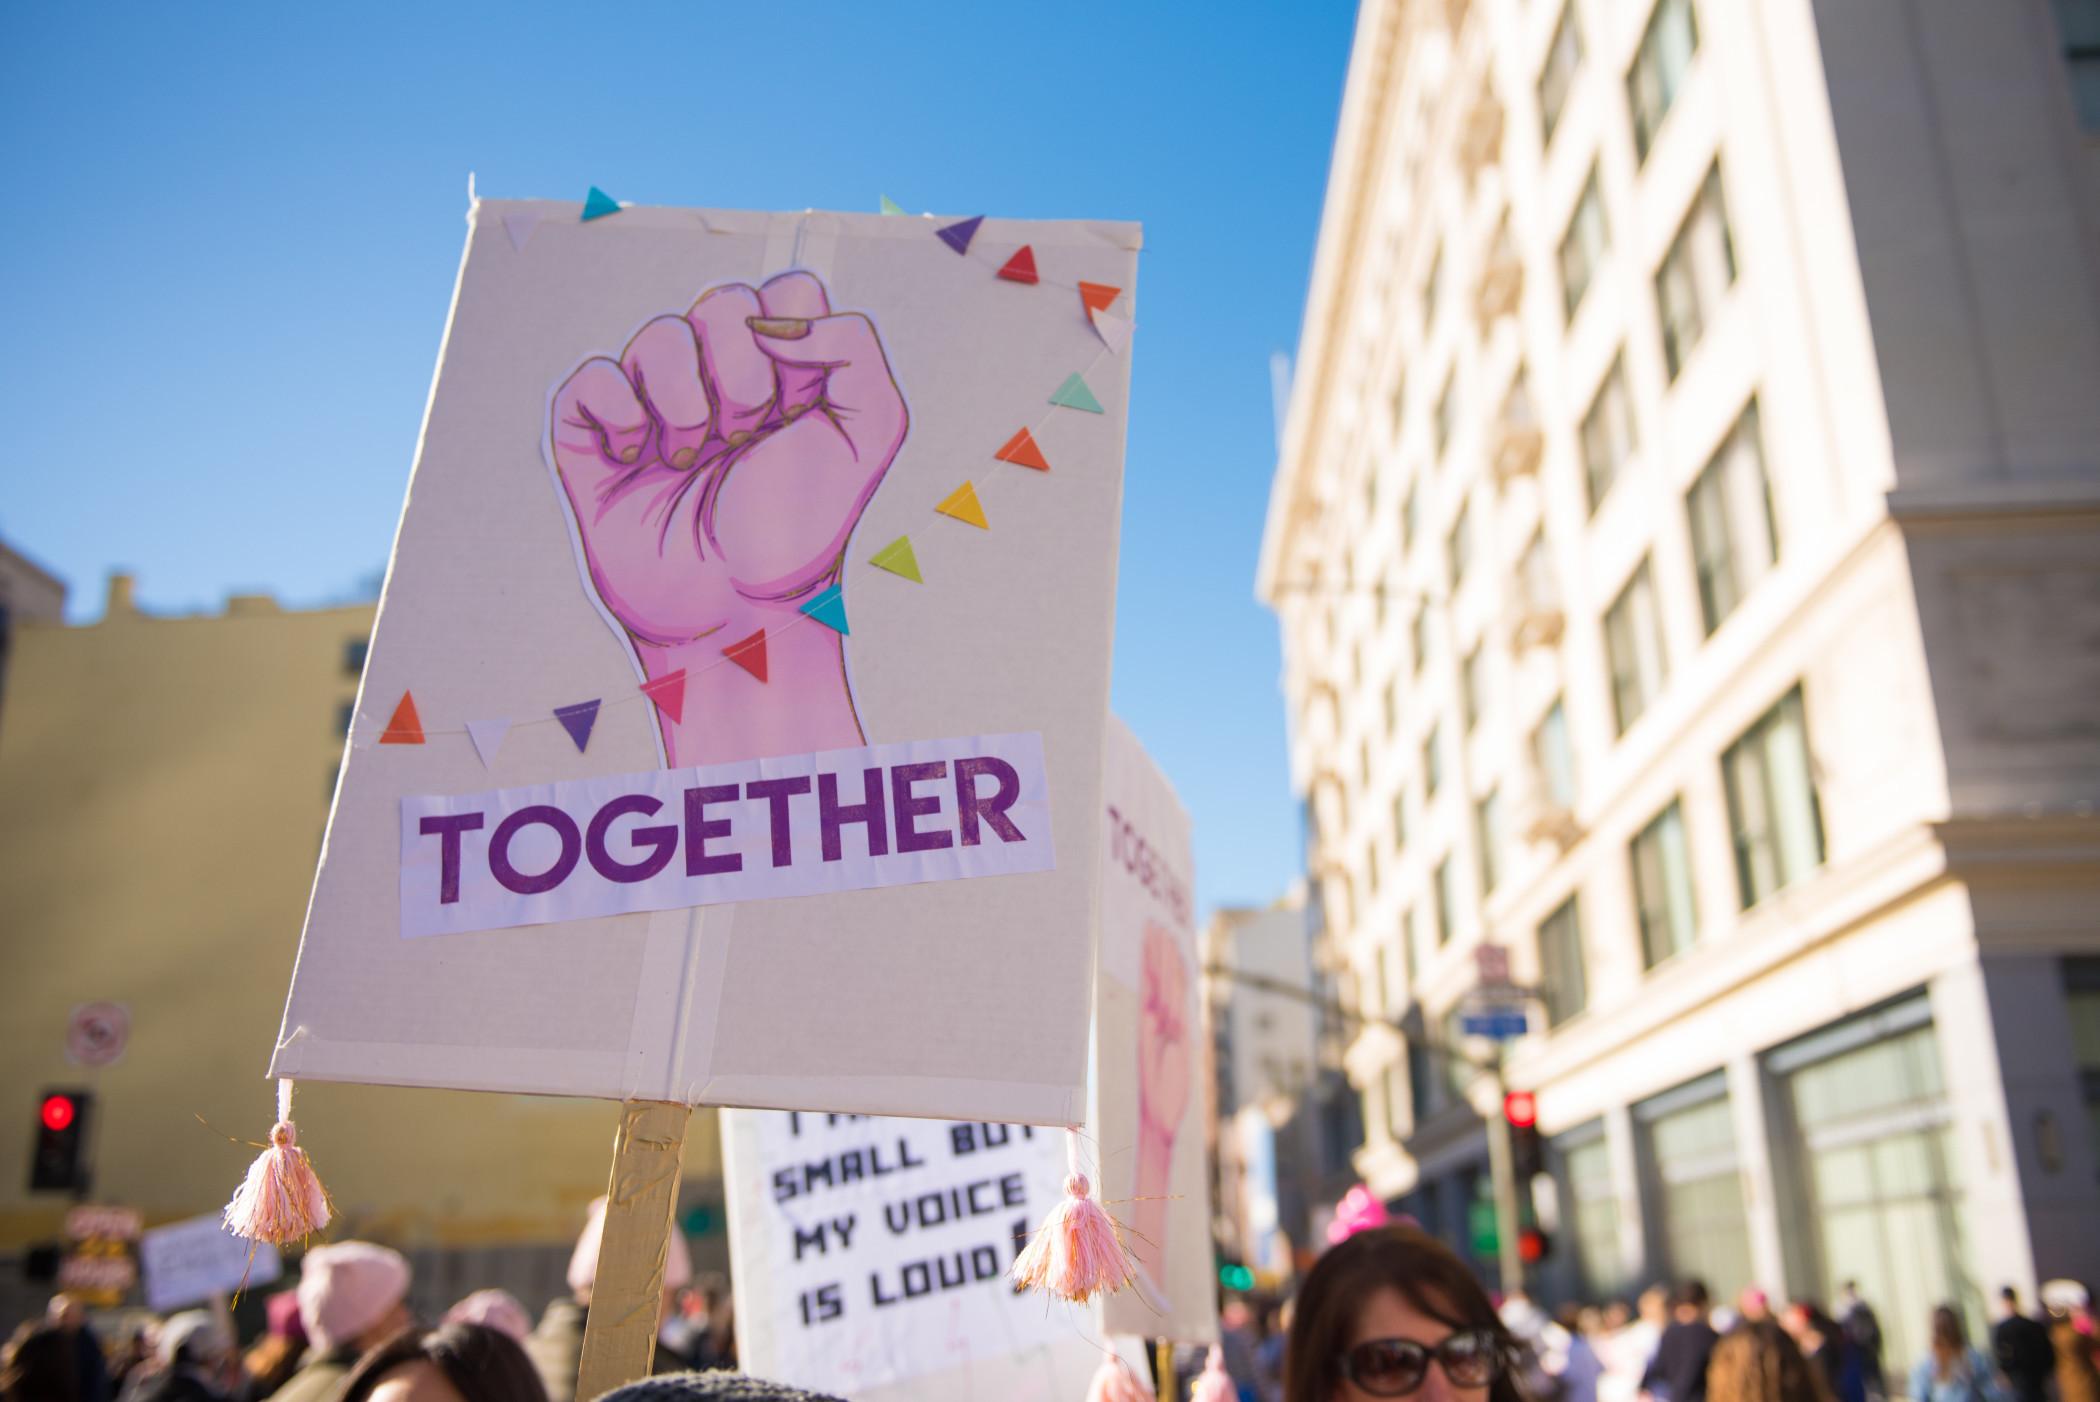 Protest poster together